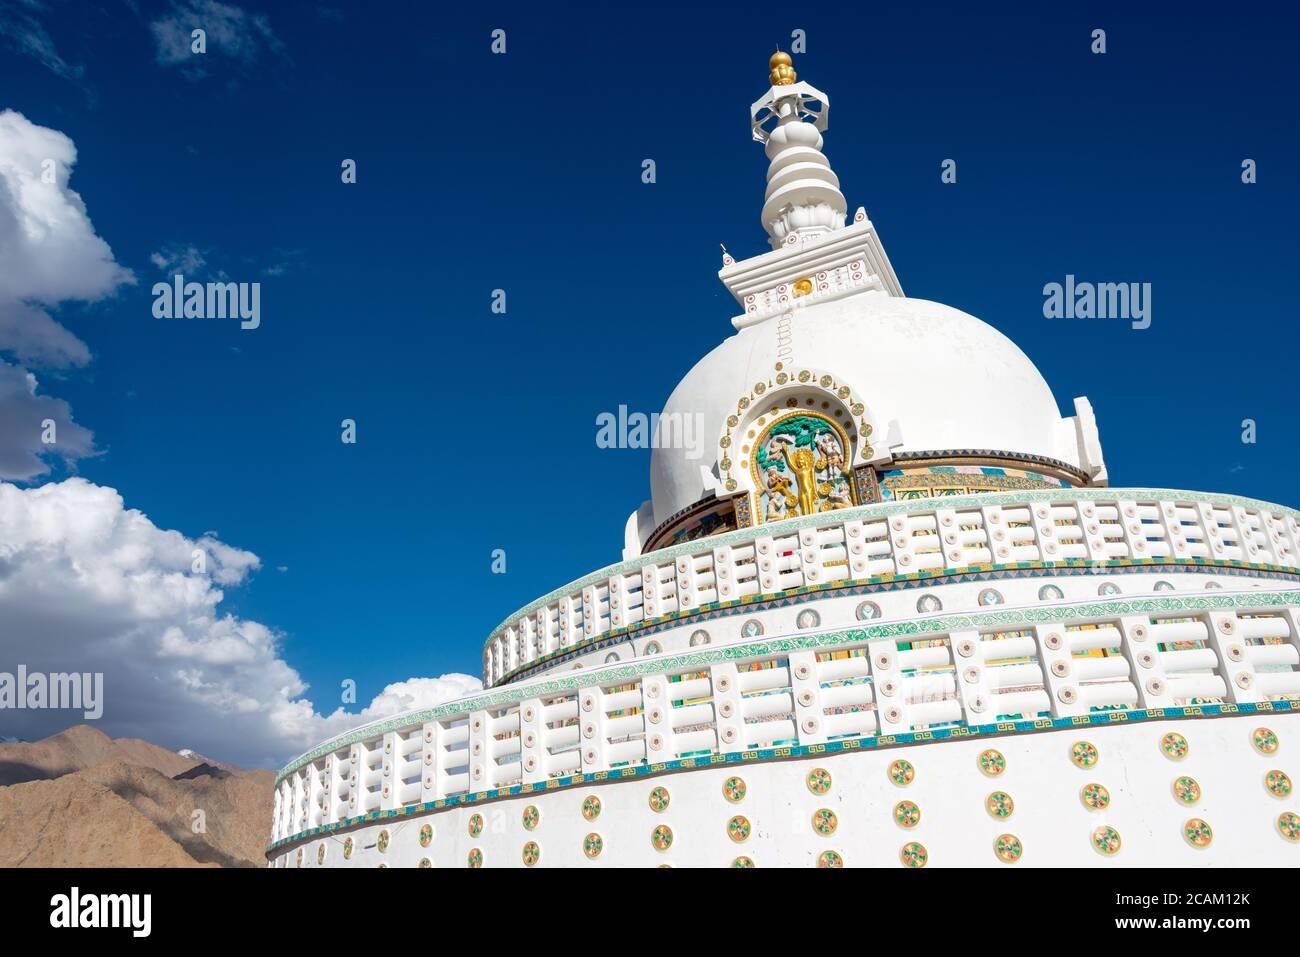 Ladakh, India - Shanti Stupa in Leh, Ladakh, Jammu and Kashmir, India. Stock Photo